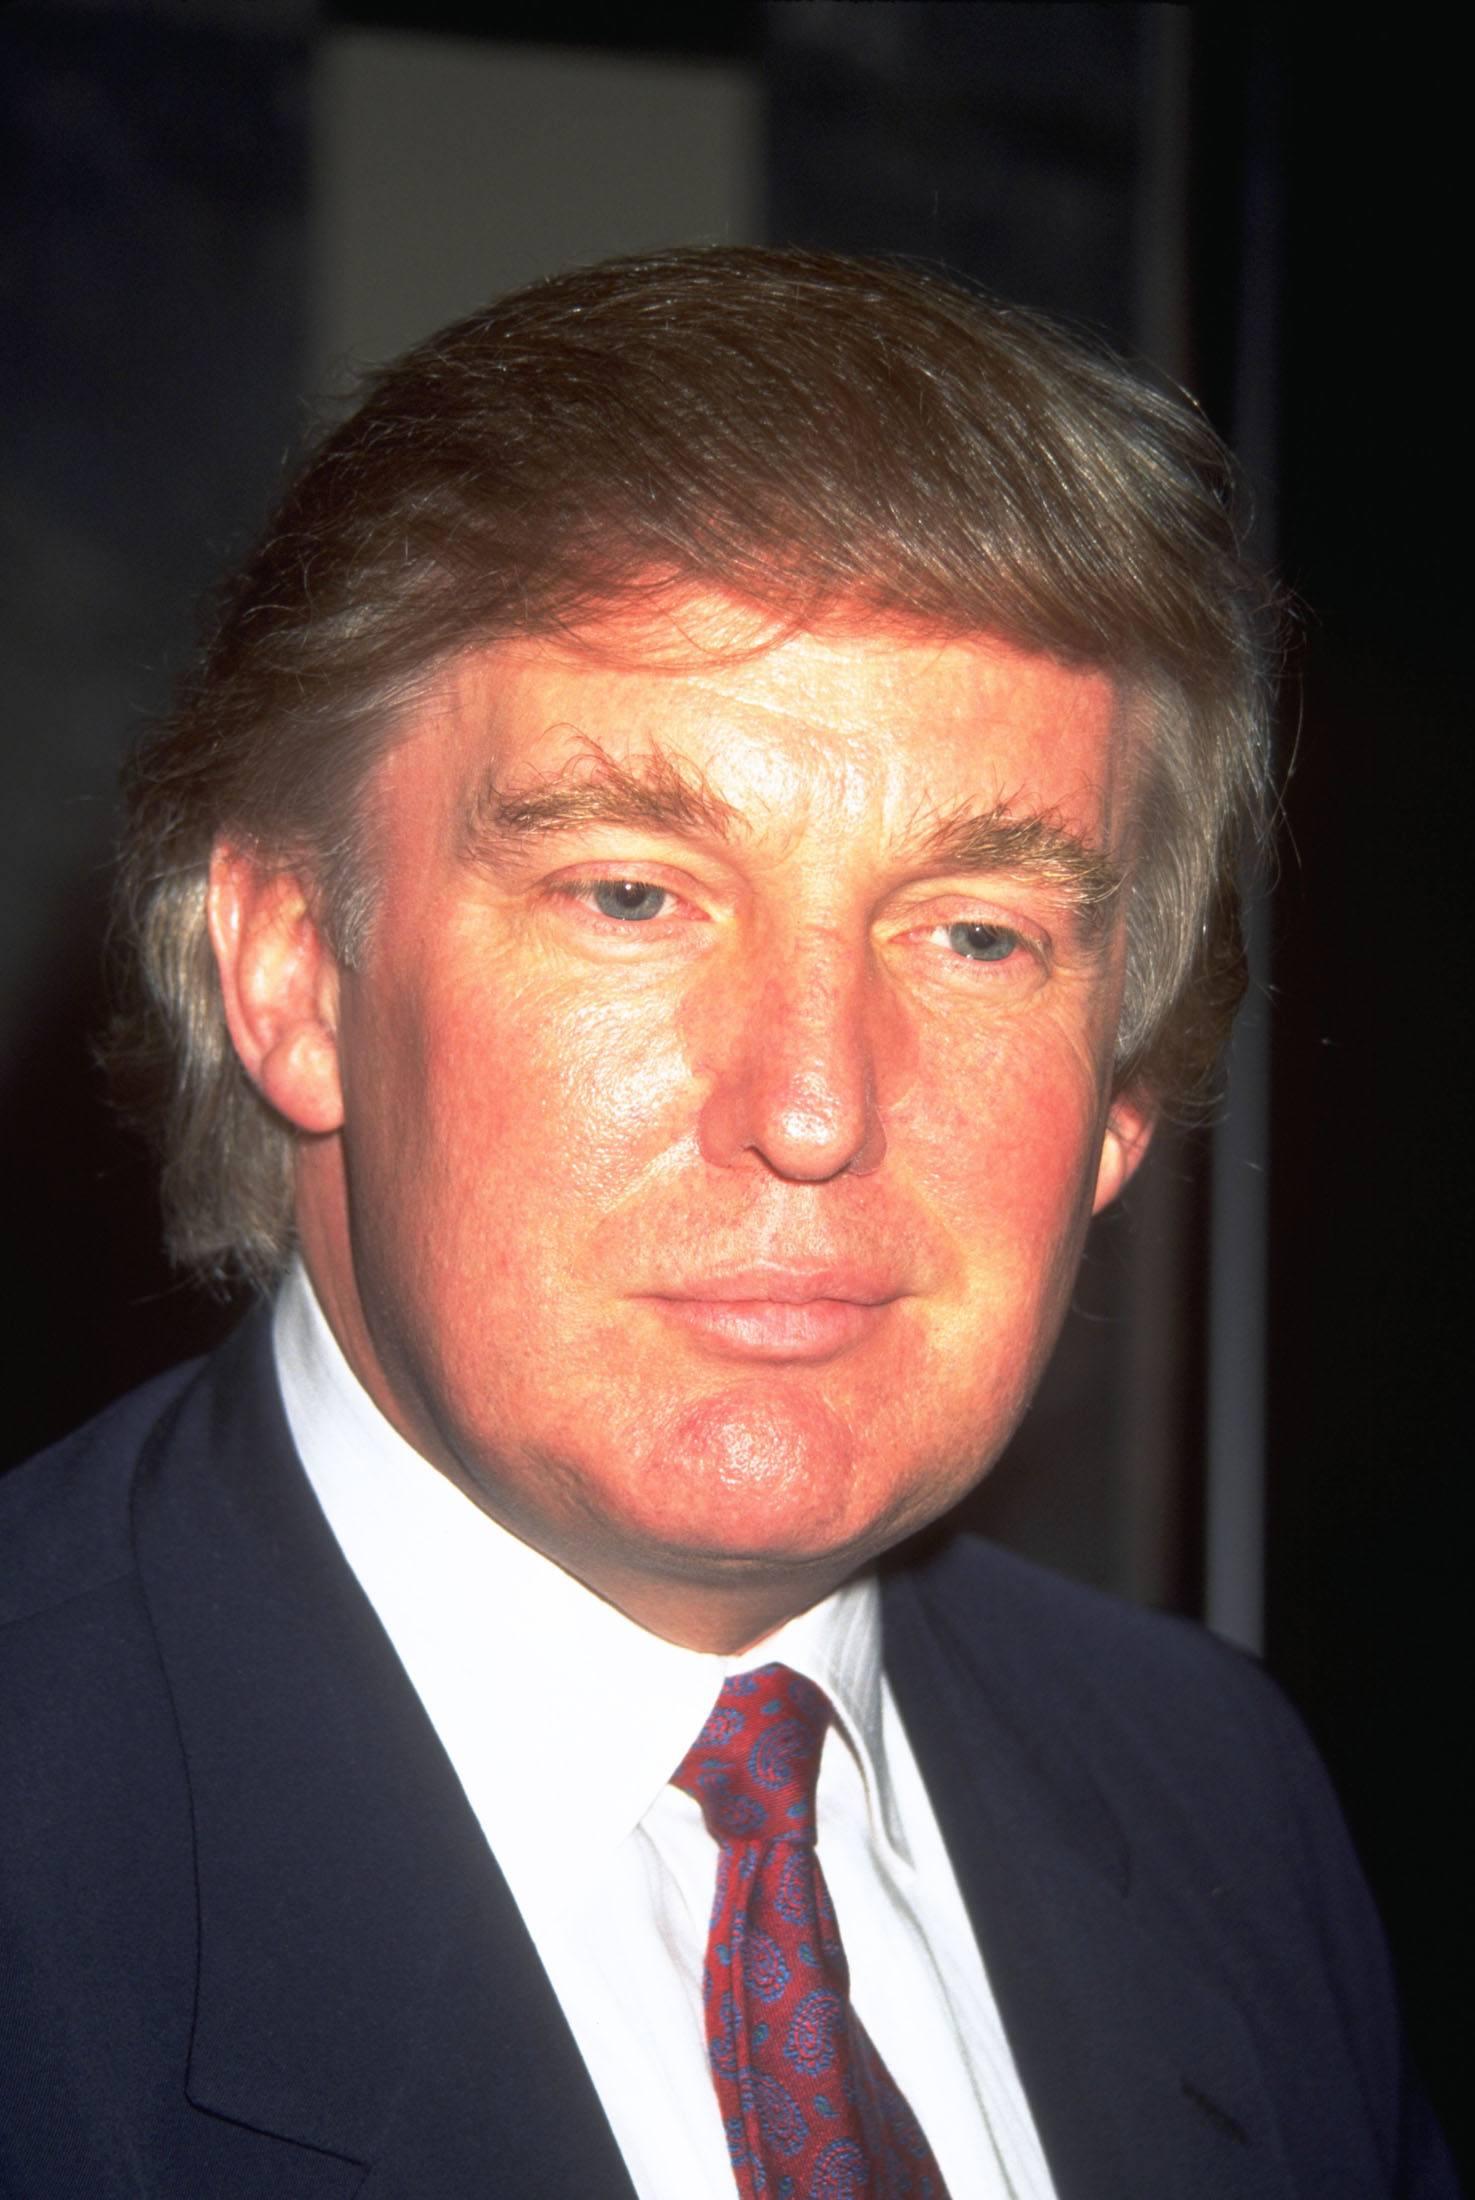 Donald Trump in the 90s